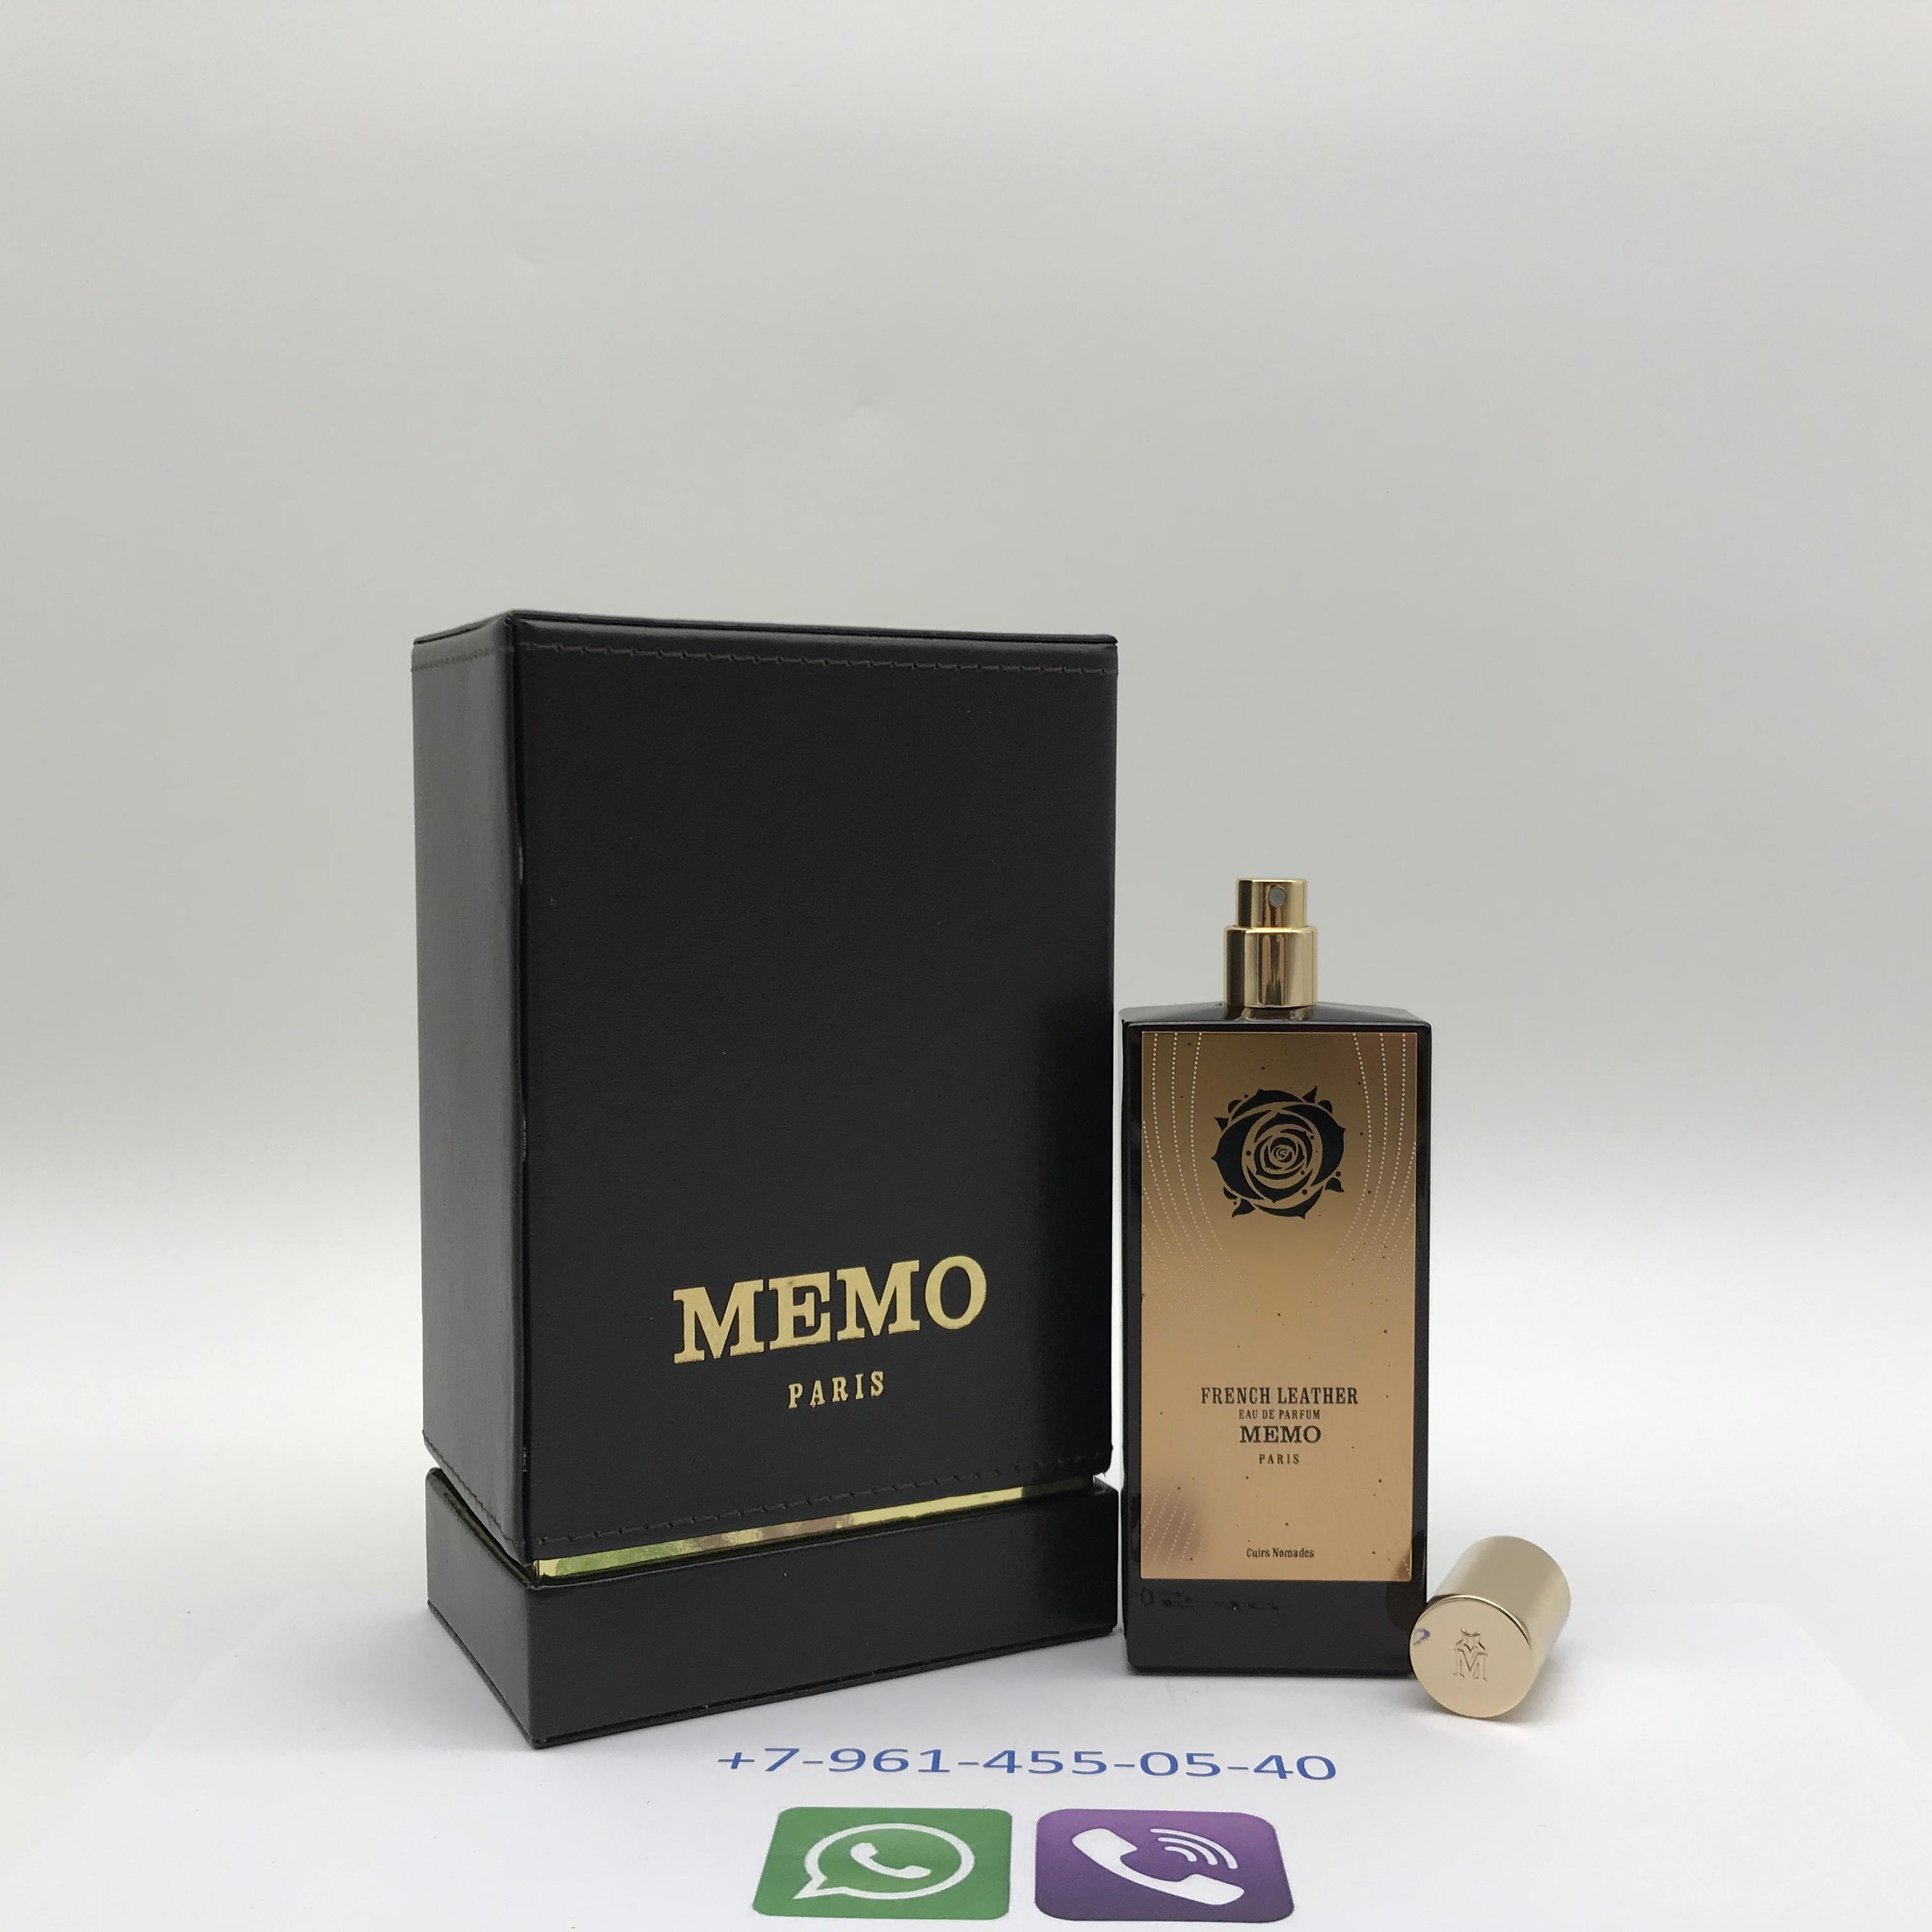 парфюм Memo отзывы